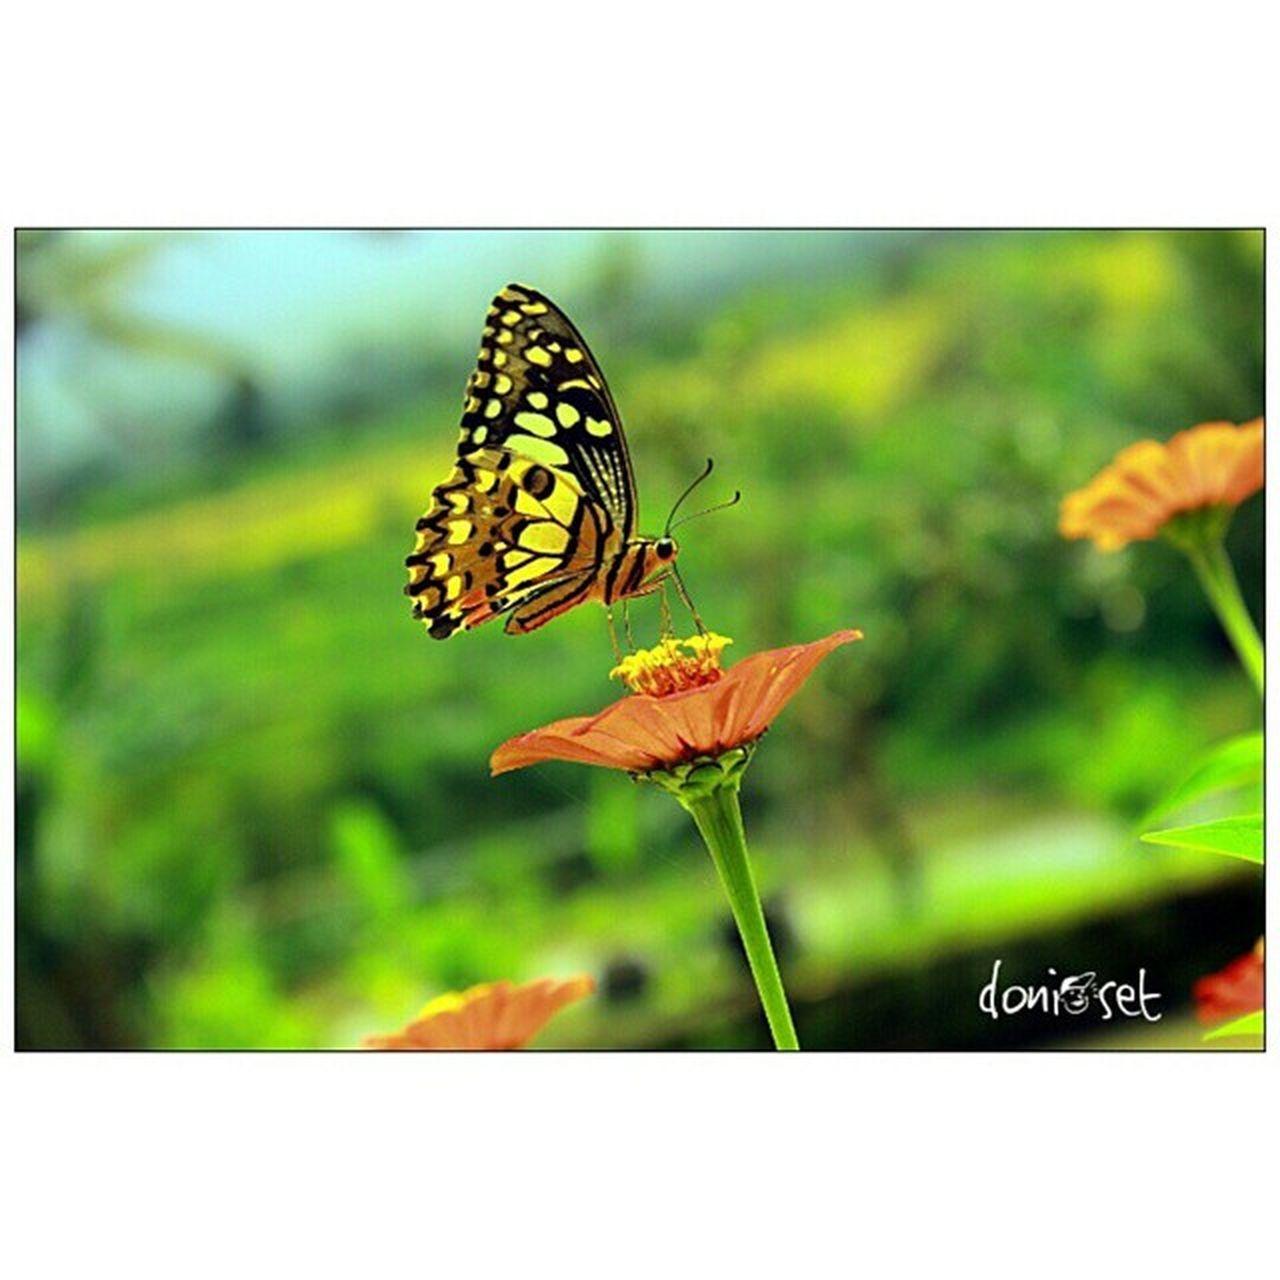 Original 😀 Original Amateur Amatir Noefek Noeffect Kupukupu Butterfly Bunga